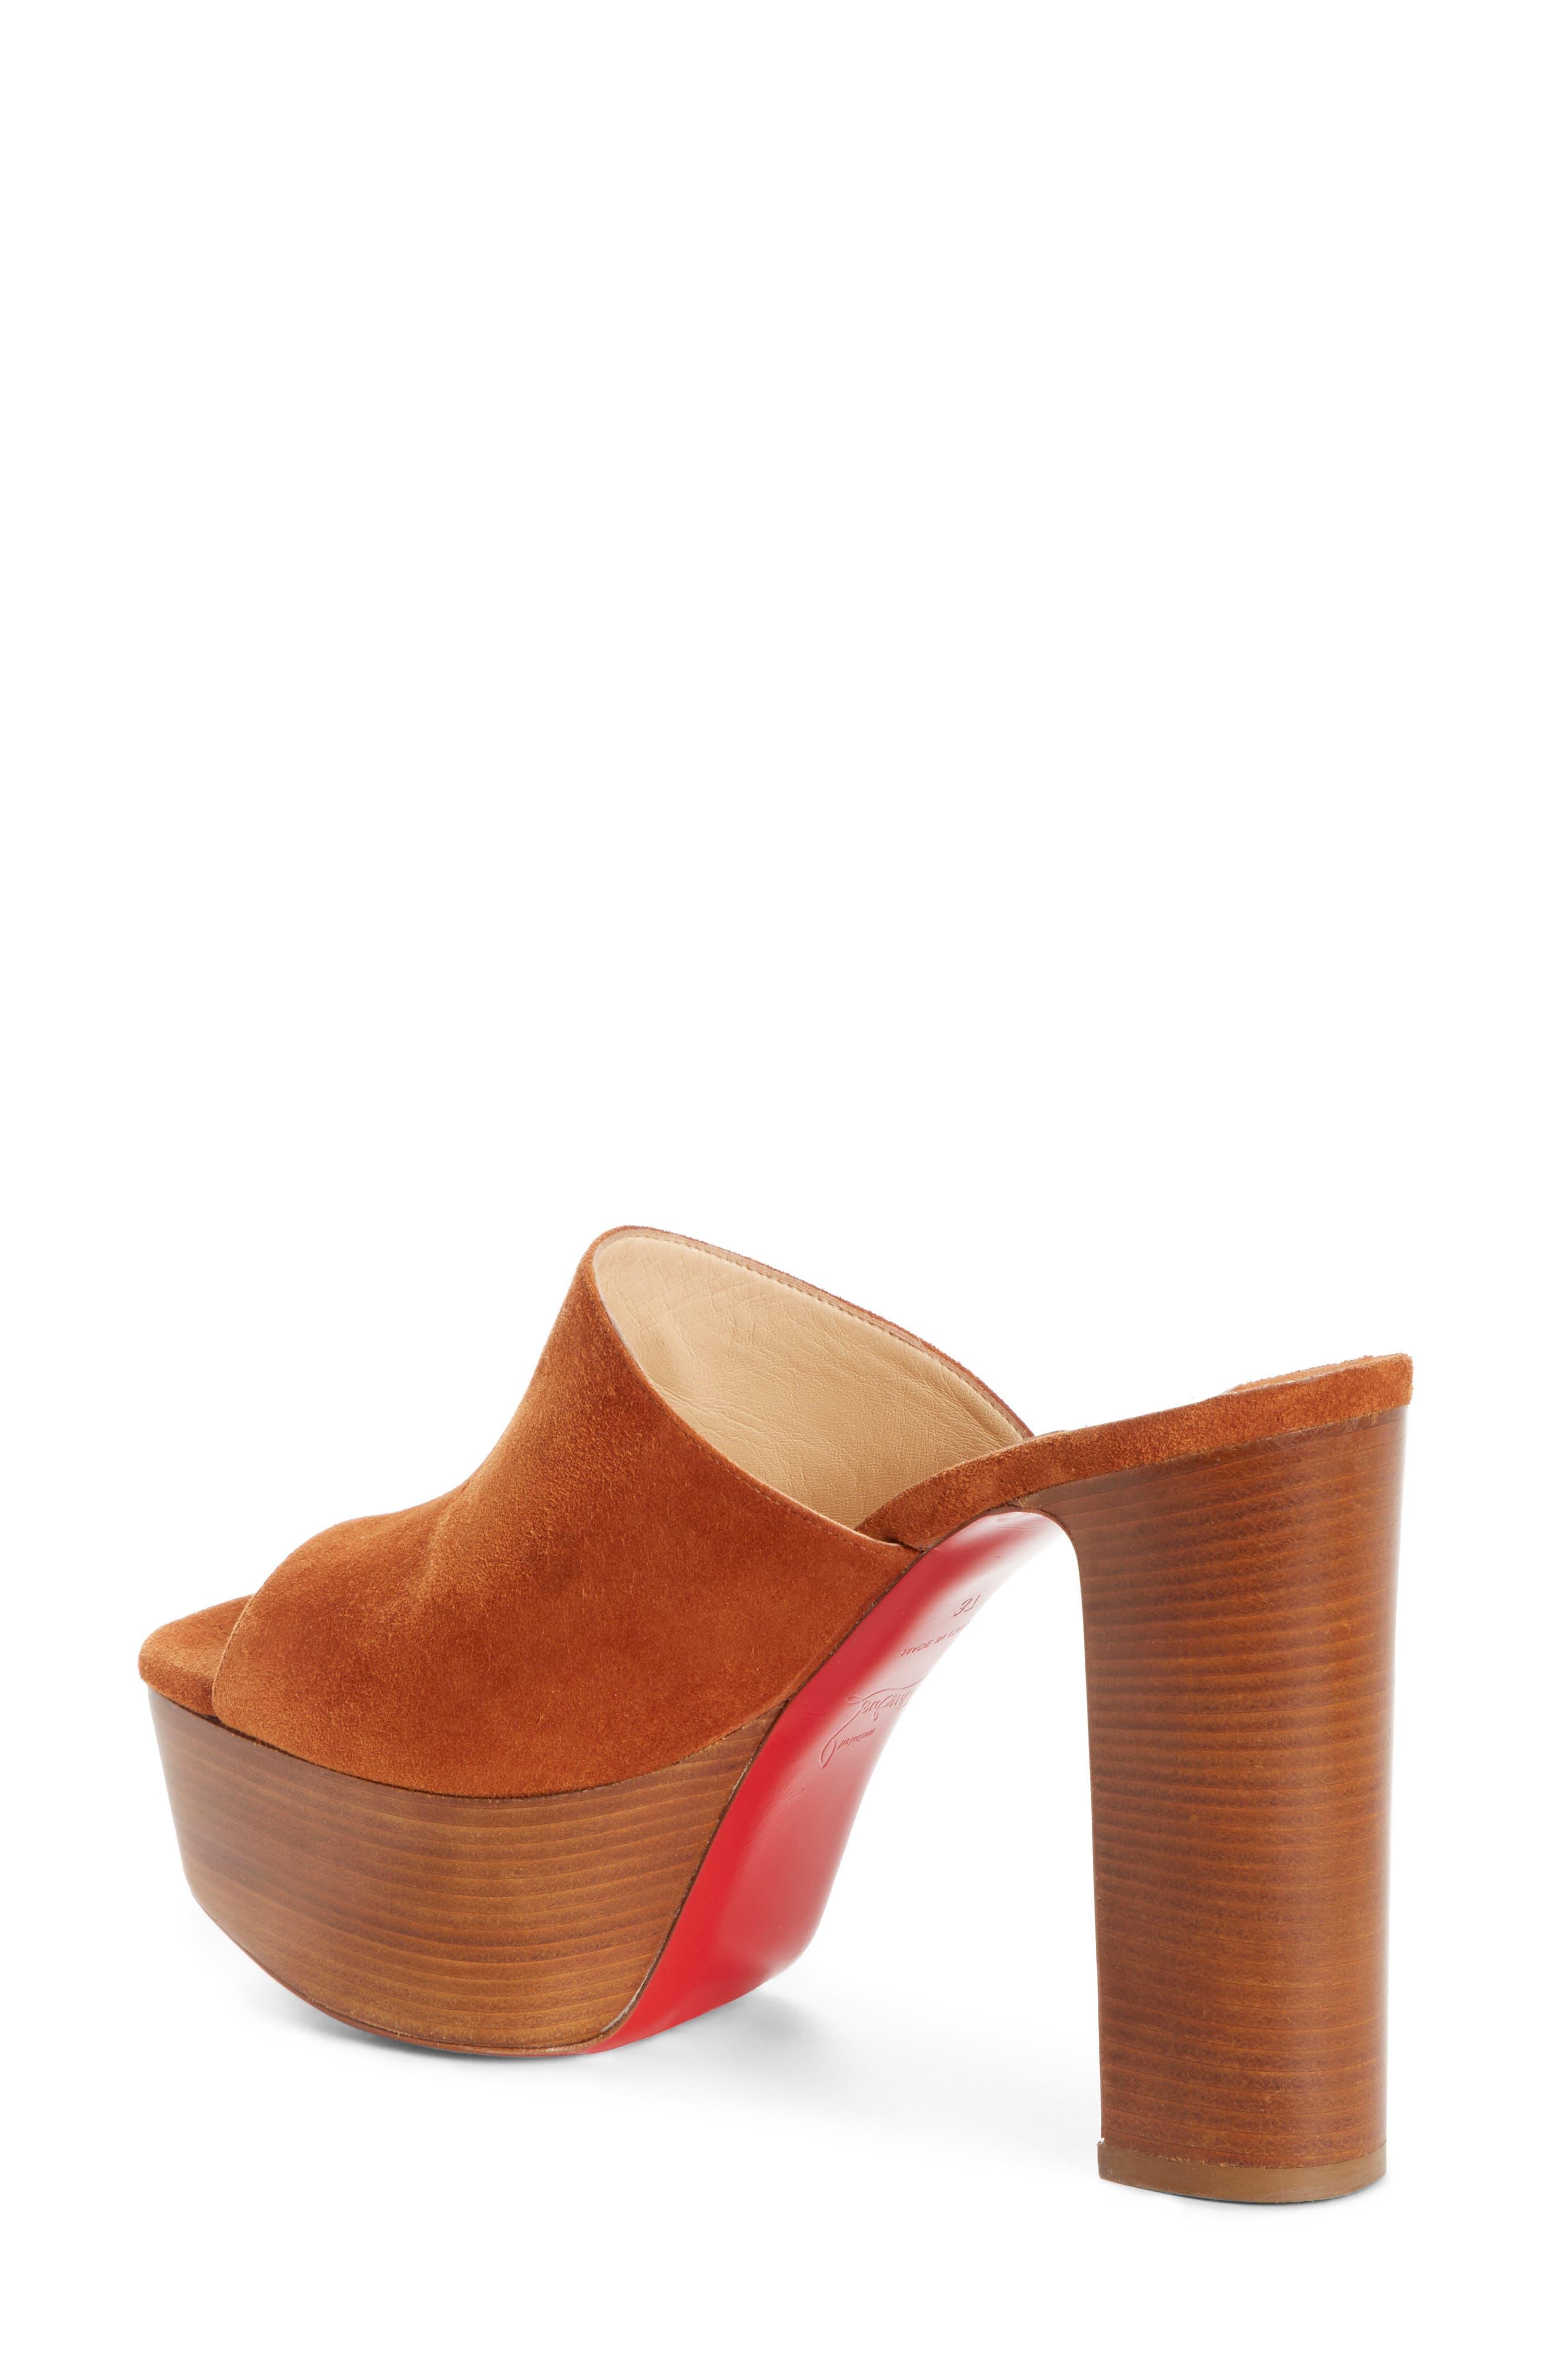 Alternate Image 2  - Christian Louboutin Suede Platform Mule Sandal (Women)